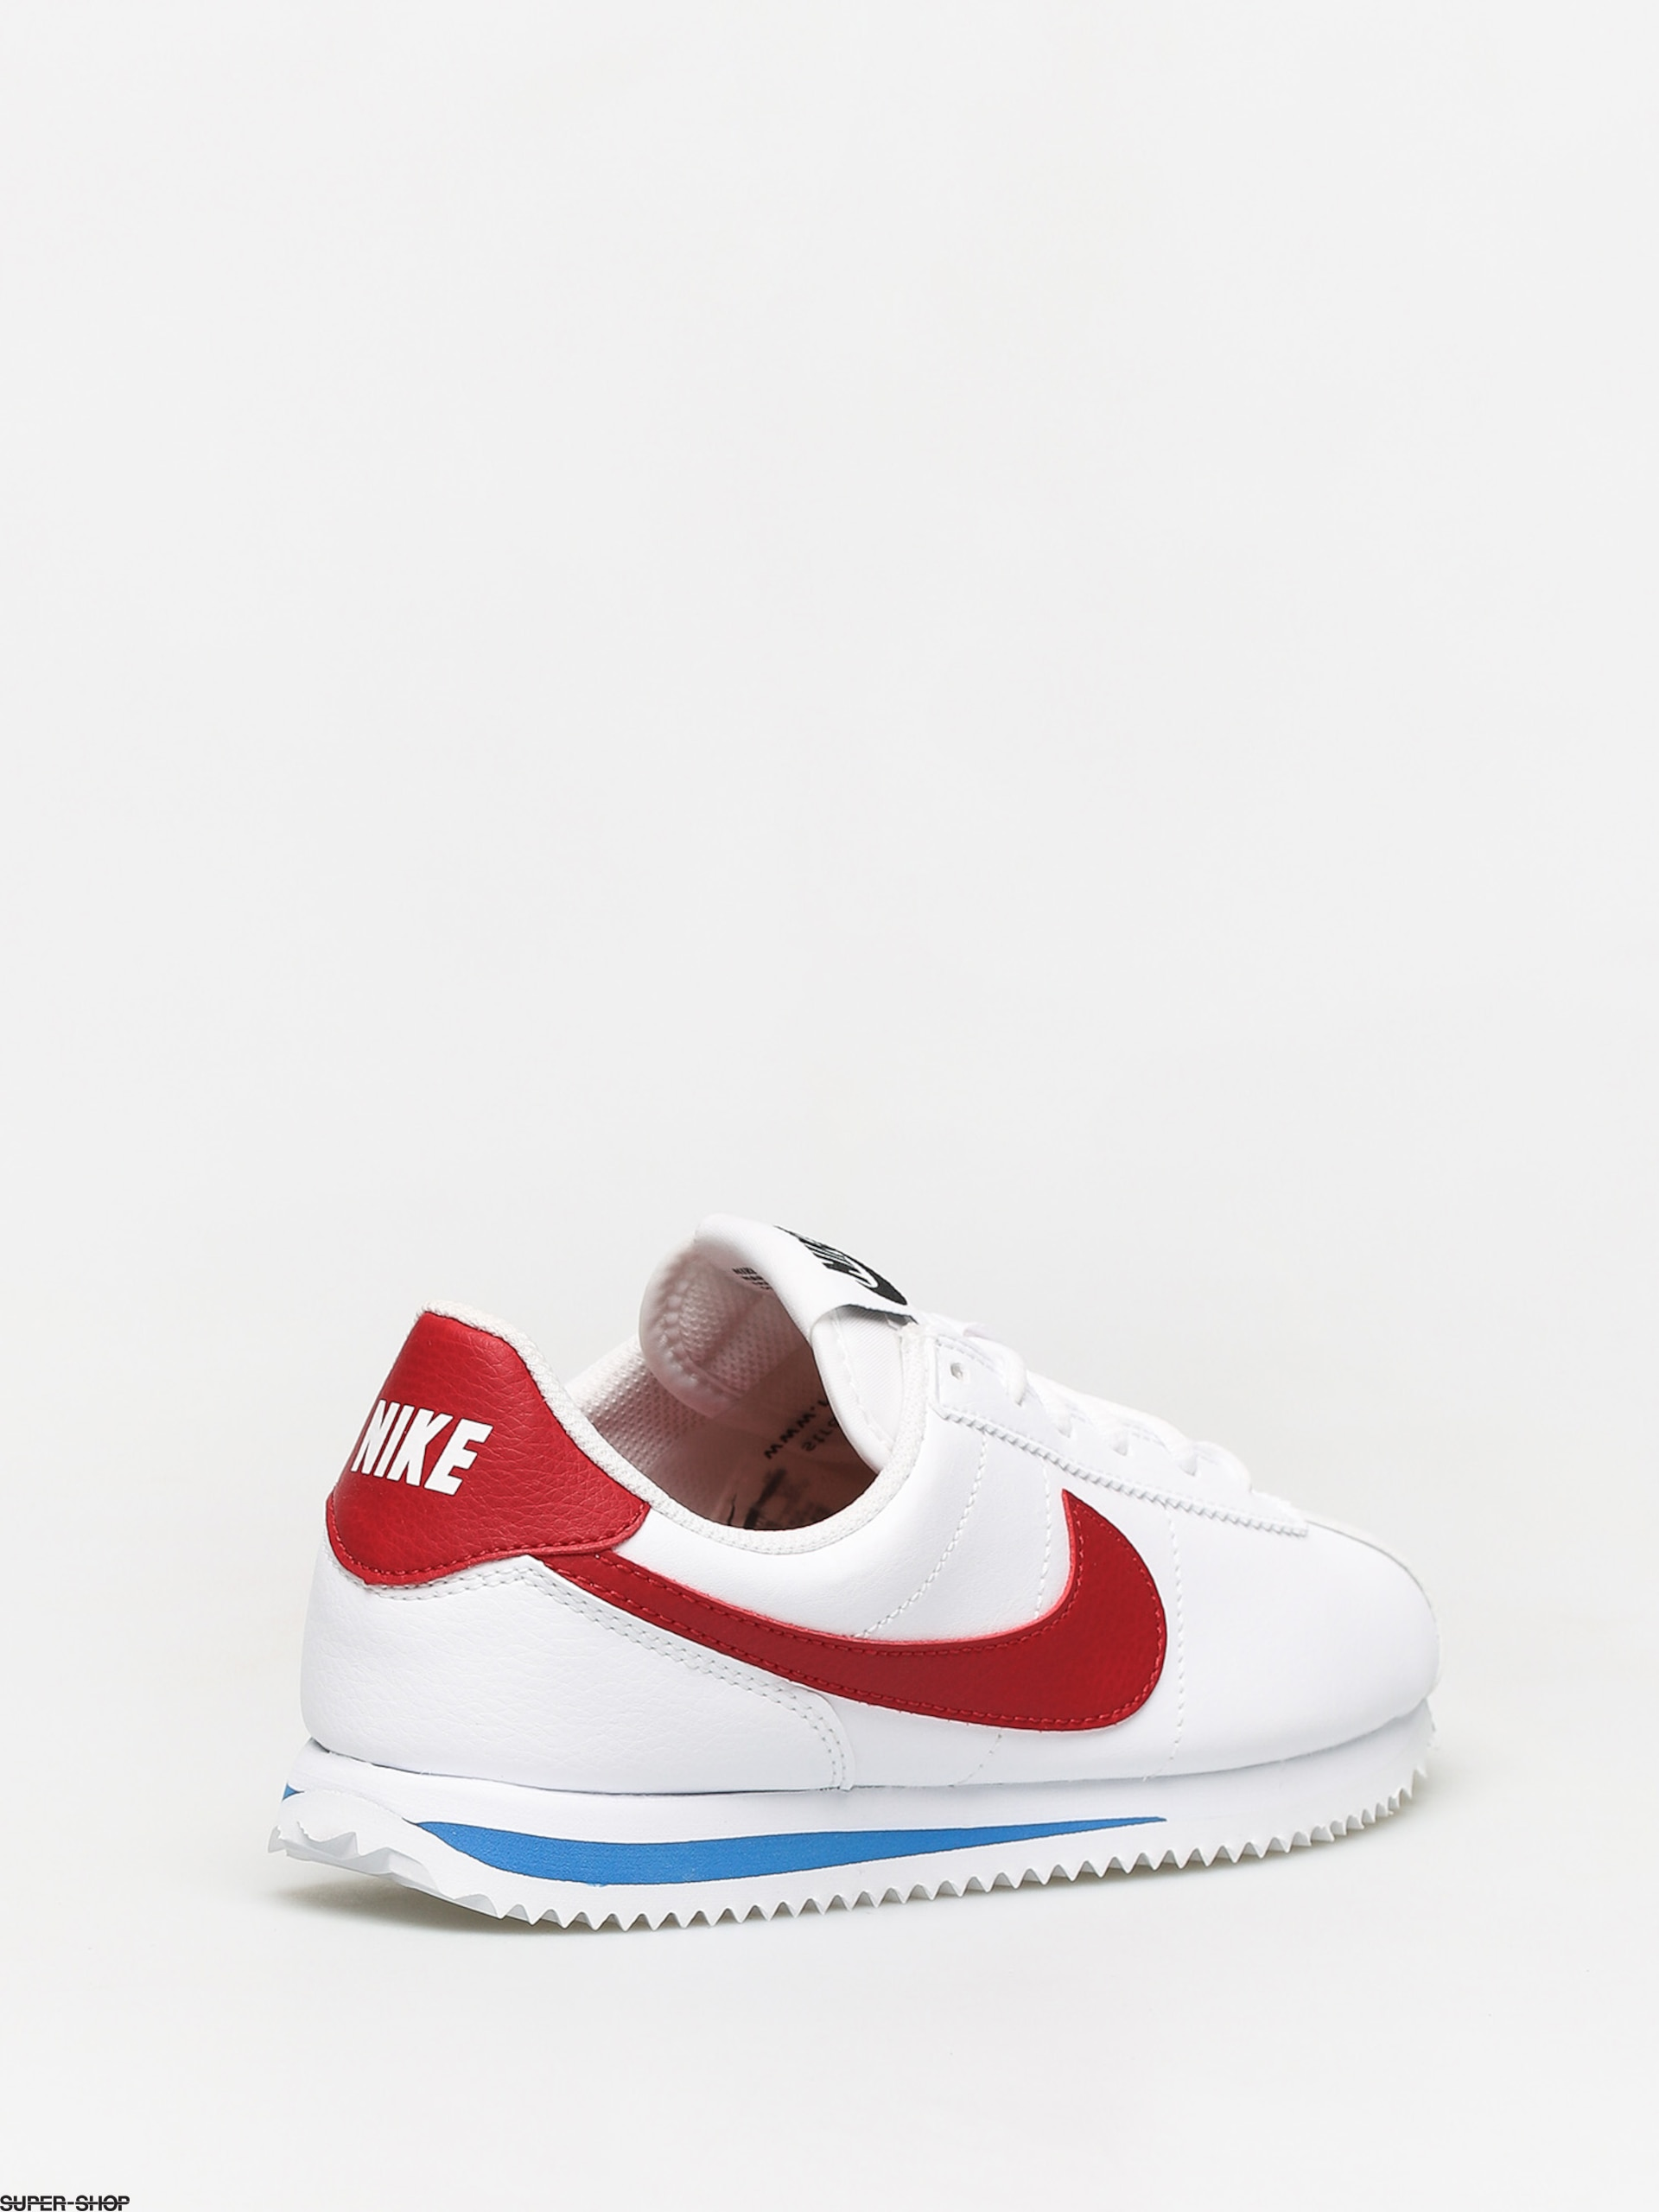 904764-103 White//Varsity Royal-Varsity Red New Nike Youth Cortez SL GS Shoes